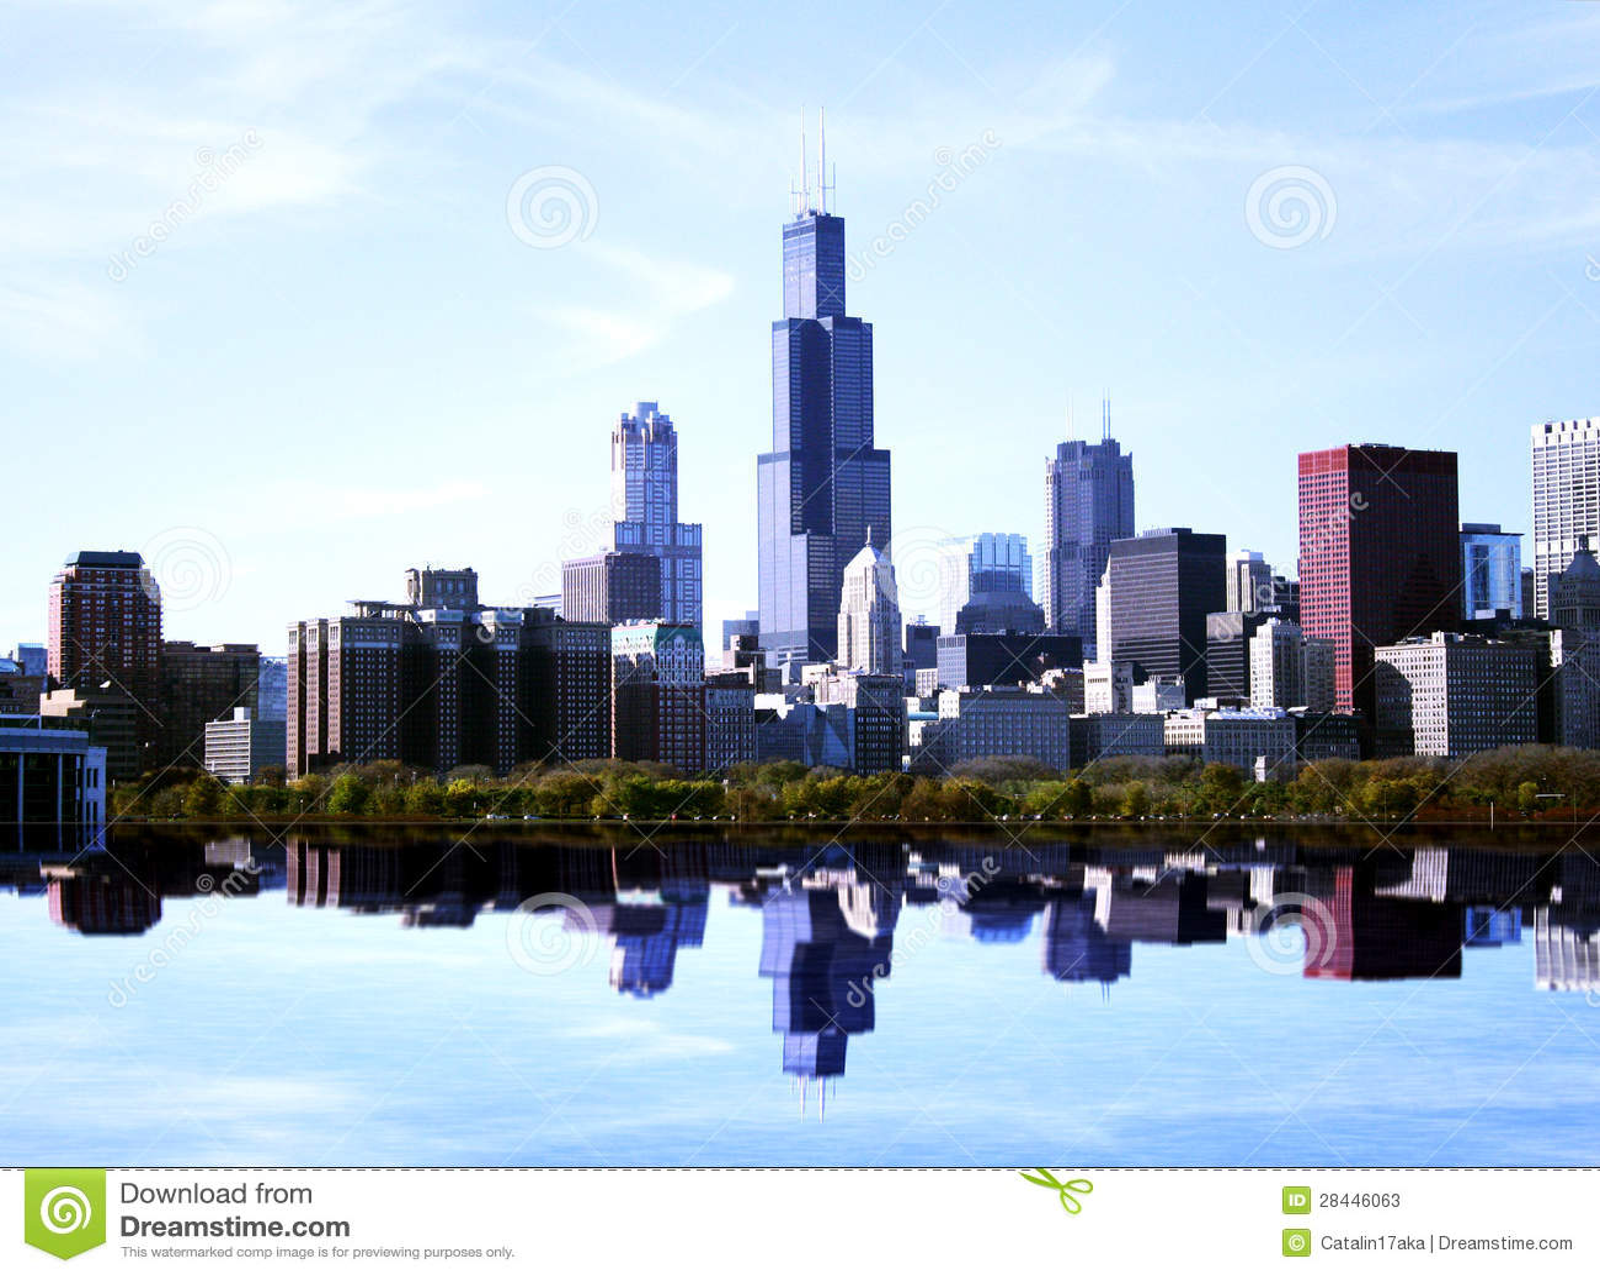 Chicago landscape stock photos image 28446063 for Chicago landscape